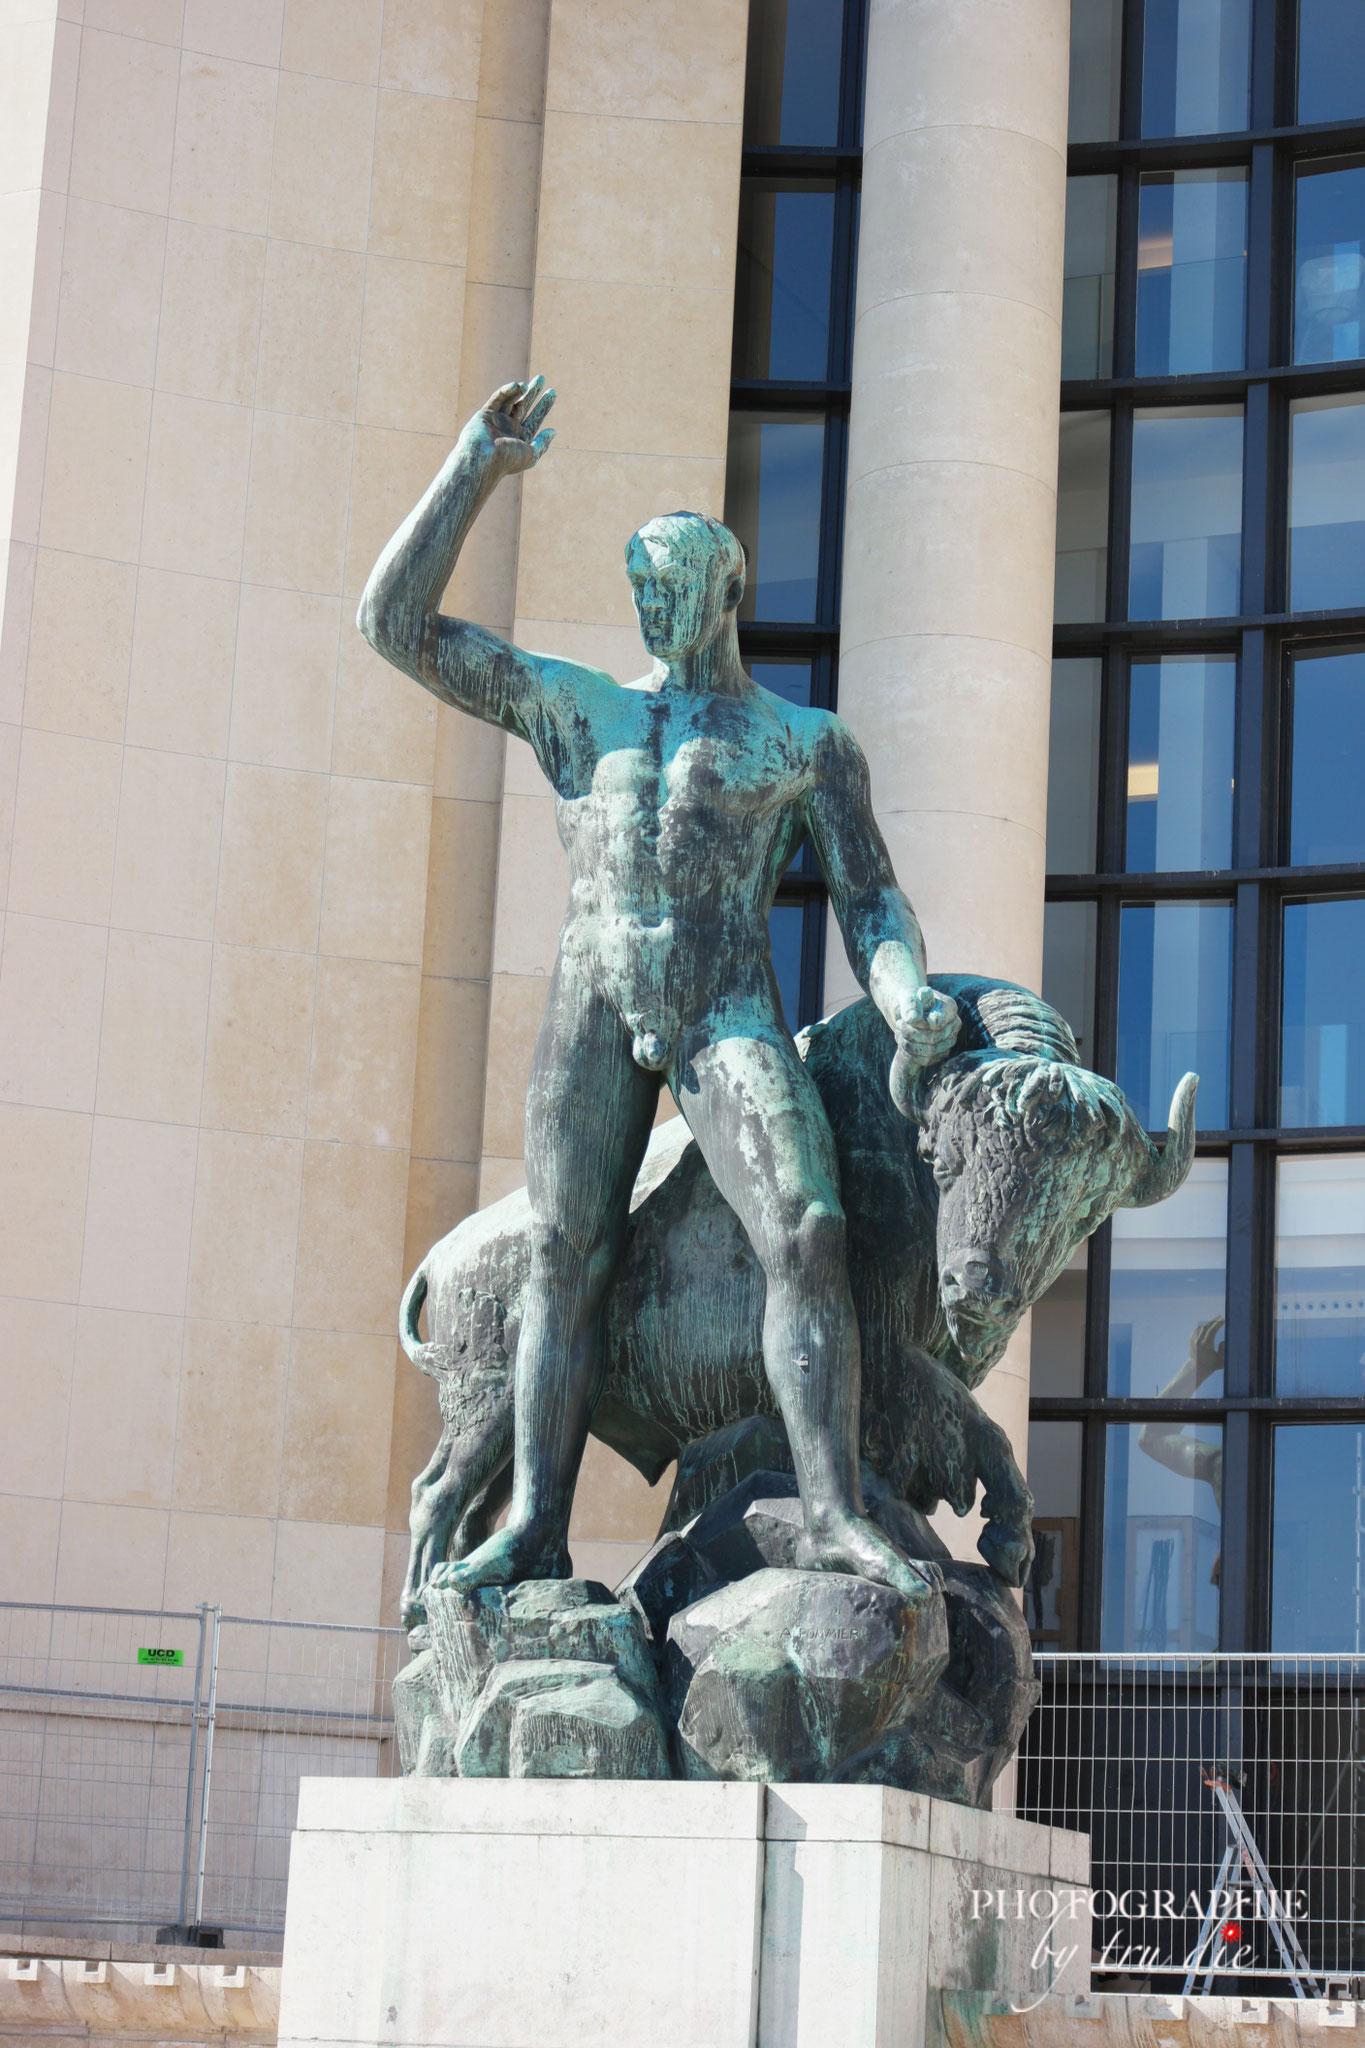 Bild: Trocadéro Bronzstatue vor dem Palais de Chaillot in Paris